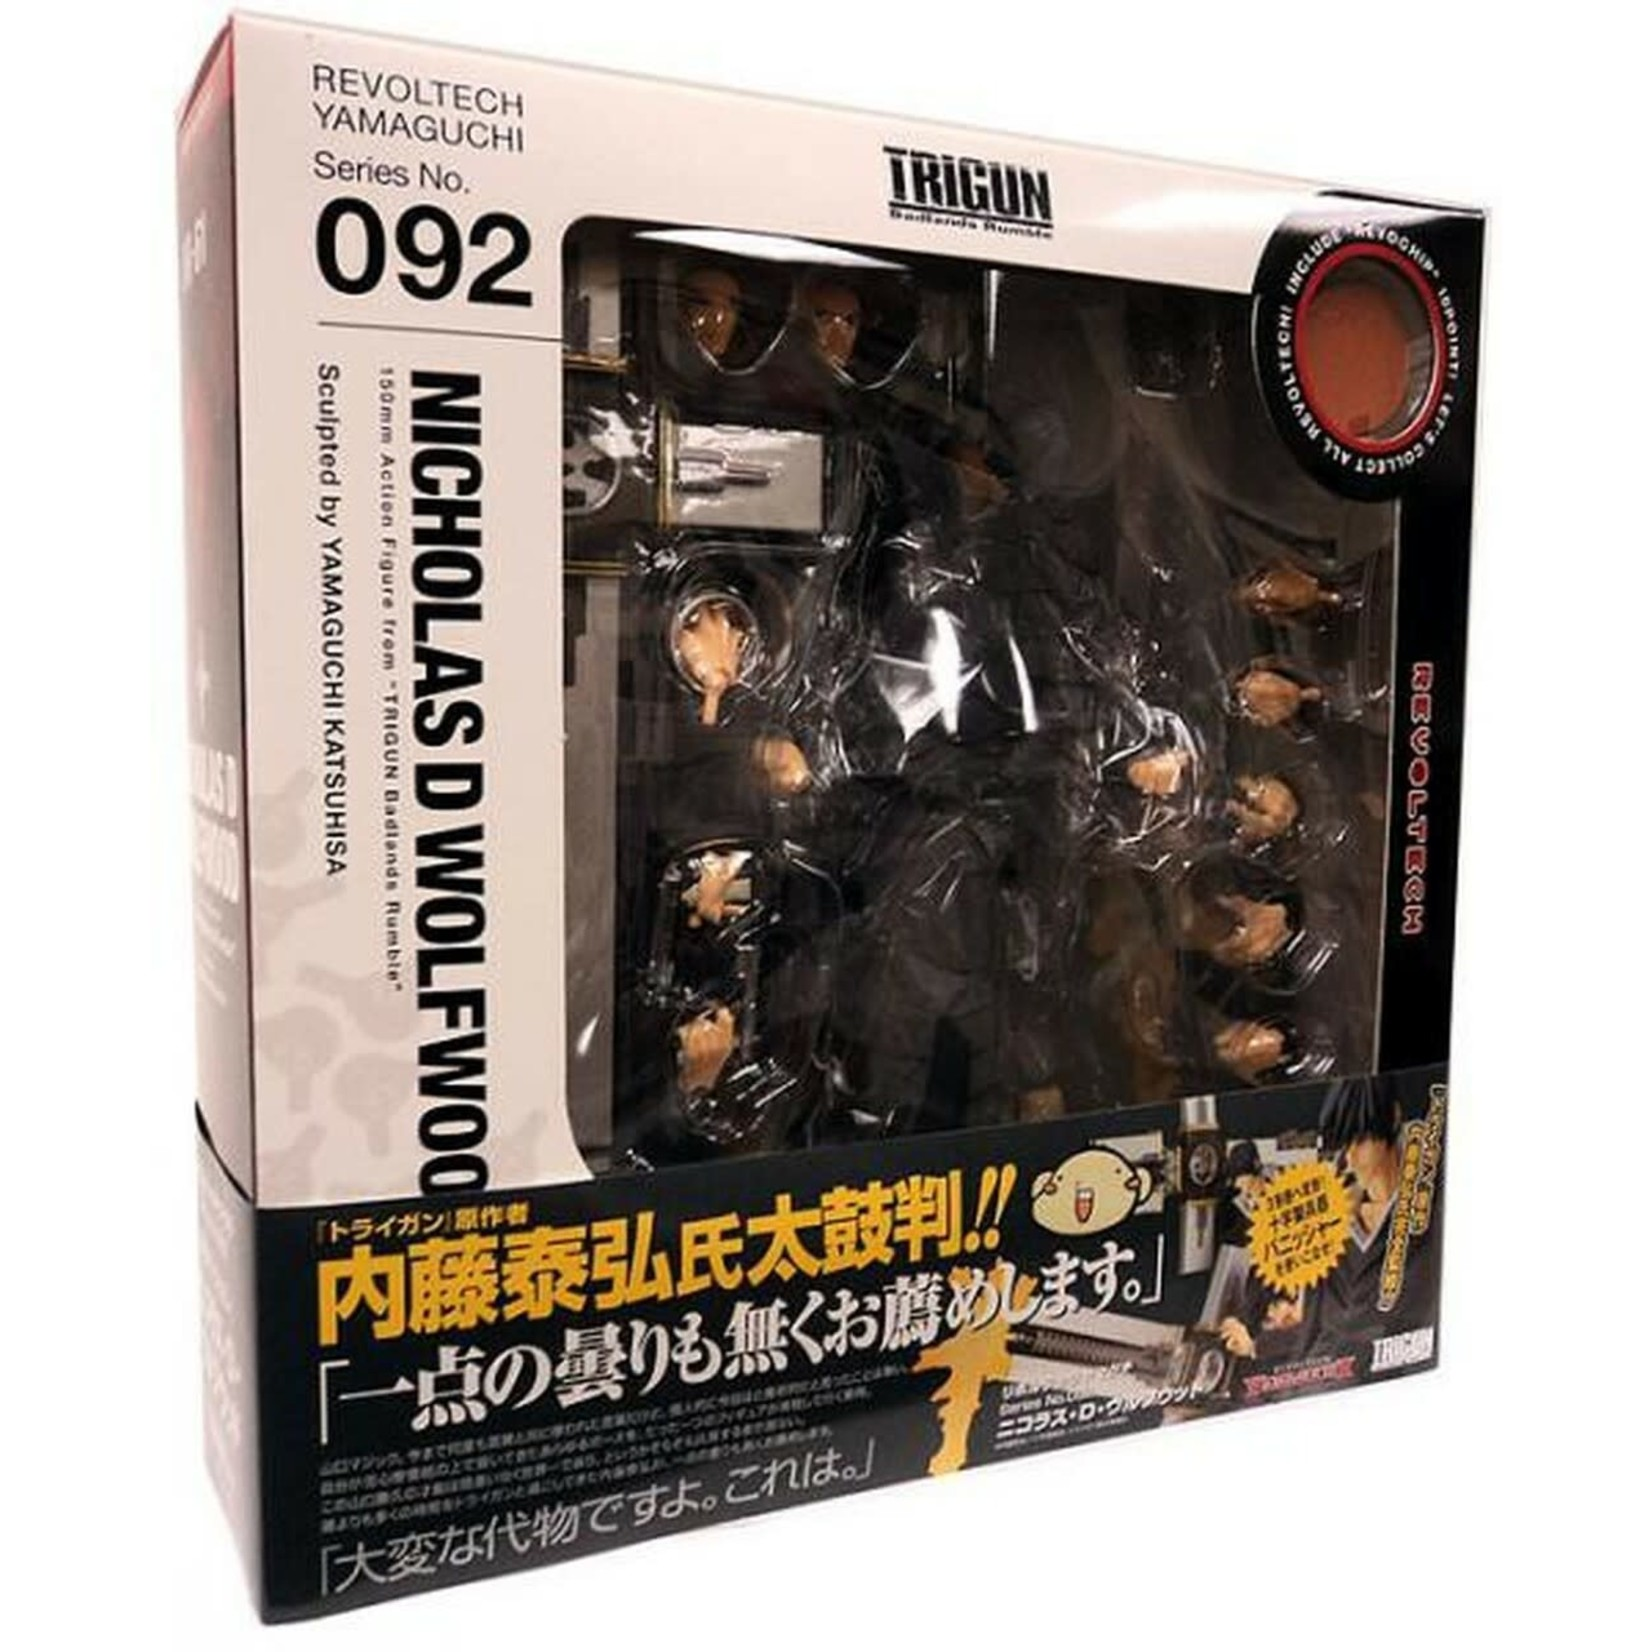 Revoltech Yamaguchi 092 Trigun - Nicholas D. Wolfwood